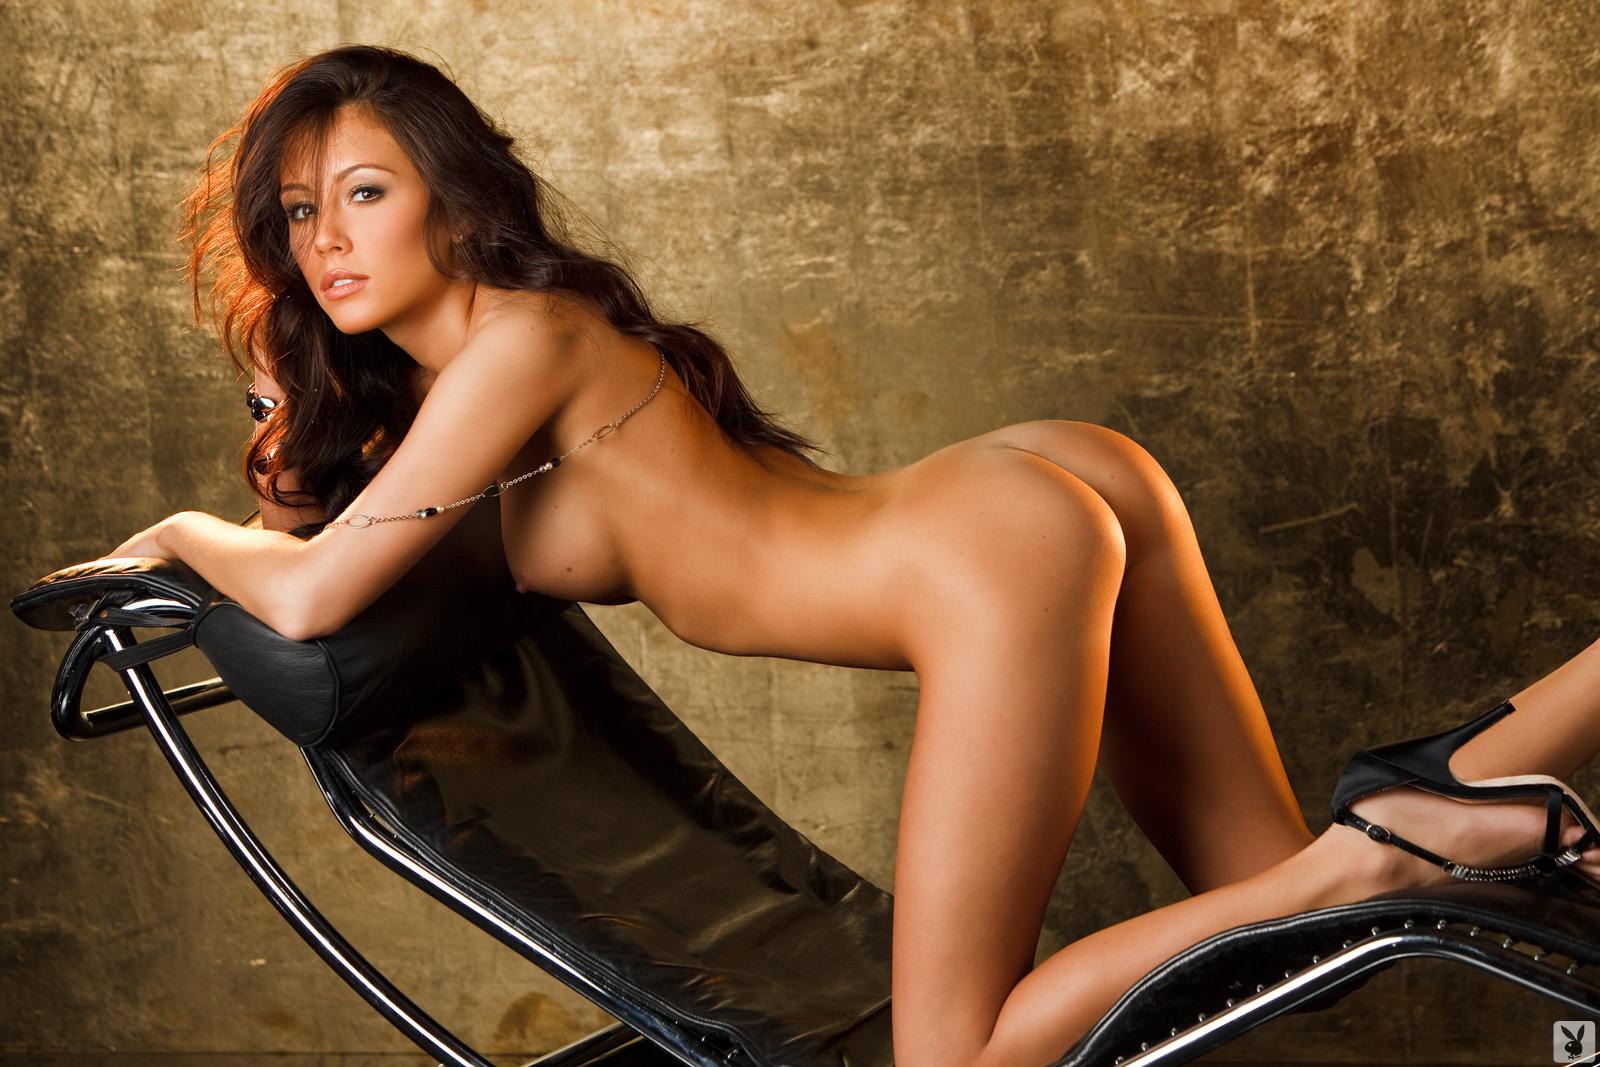 Kayla wang nude — photo 10